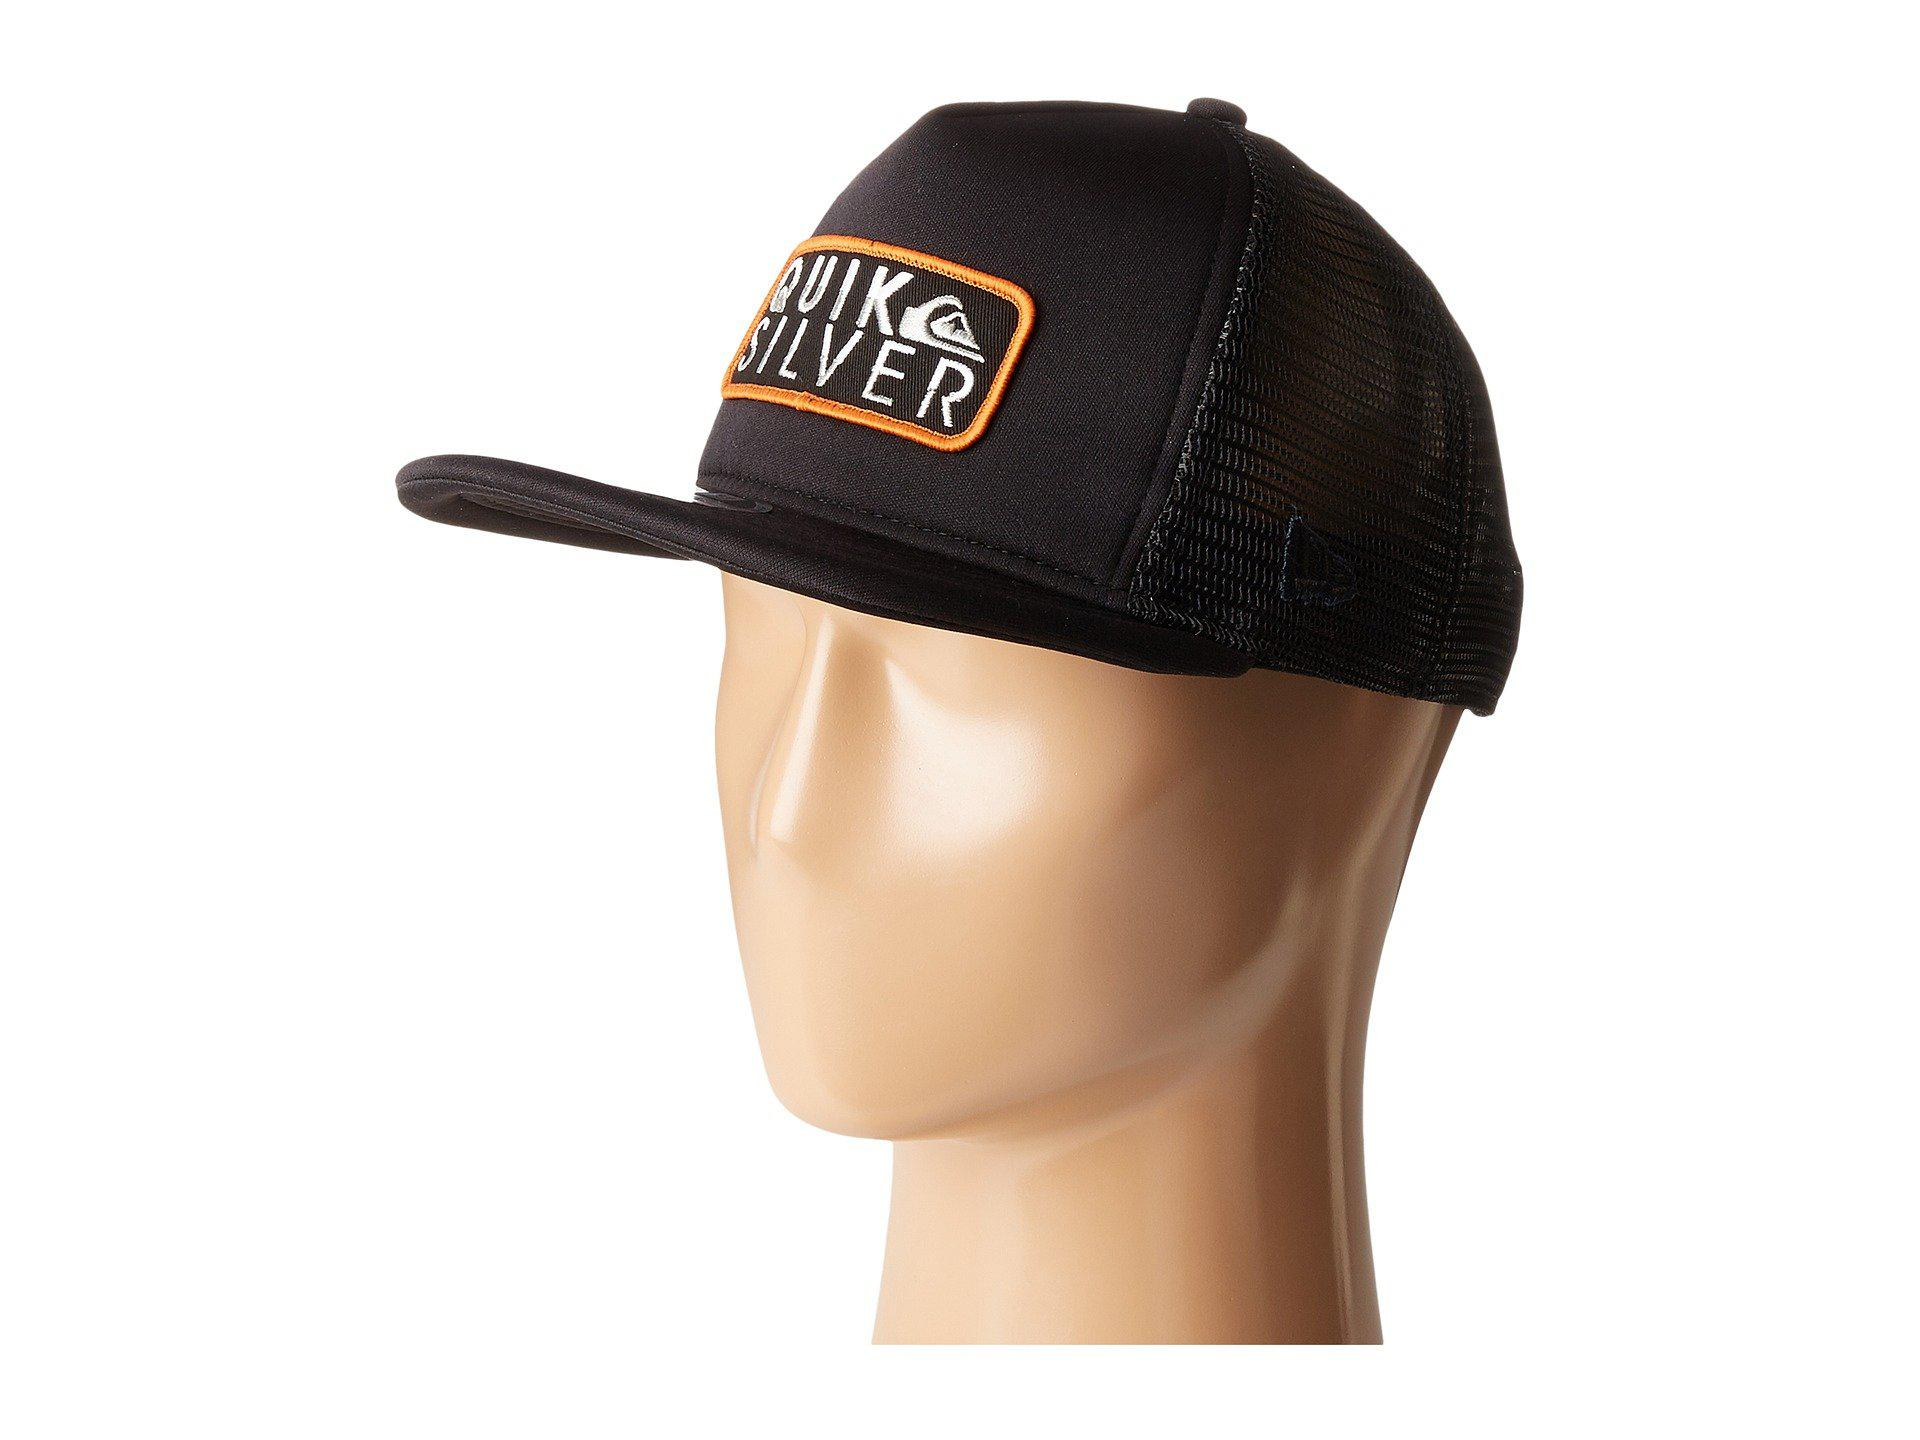 newest f0875 5835b Lyst - Quiksilver Slide Rider Hat in Black for Men